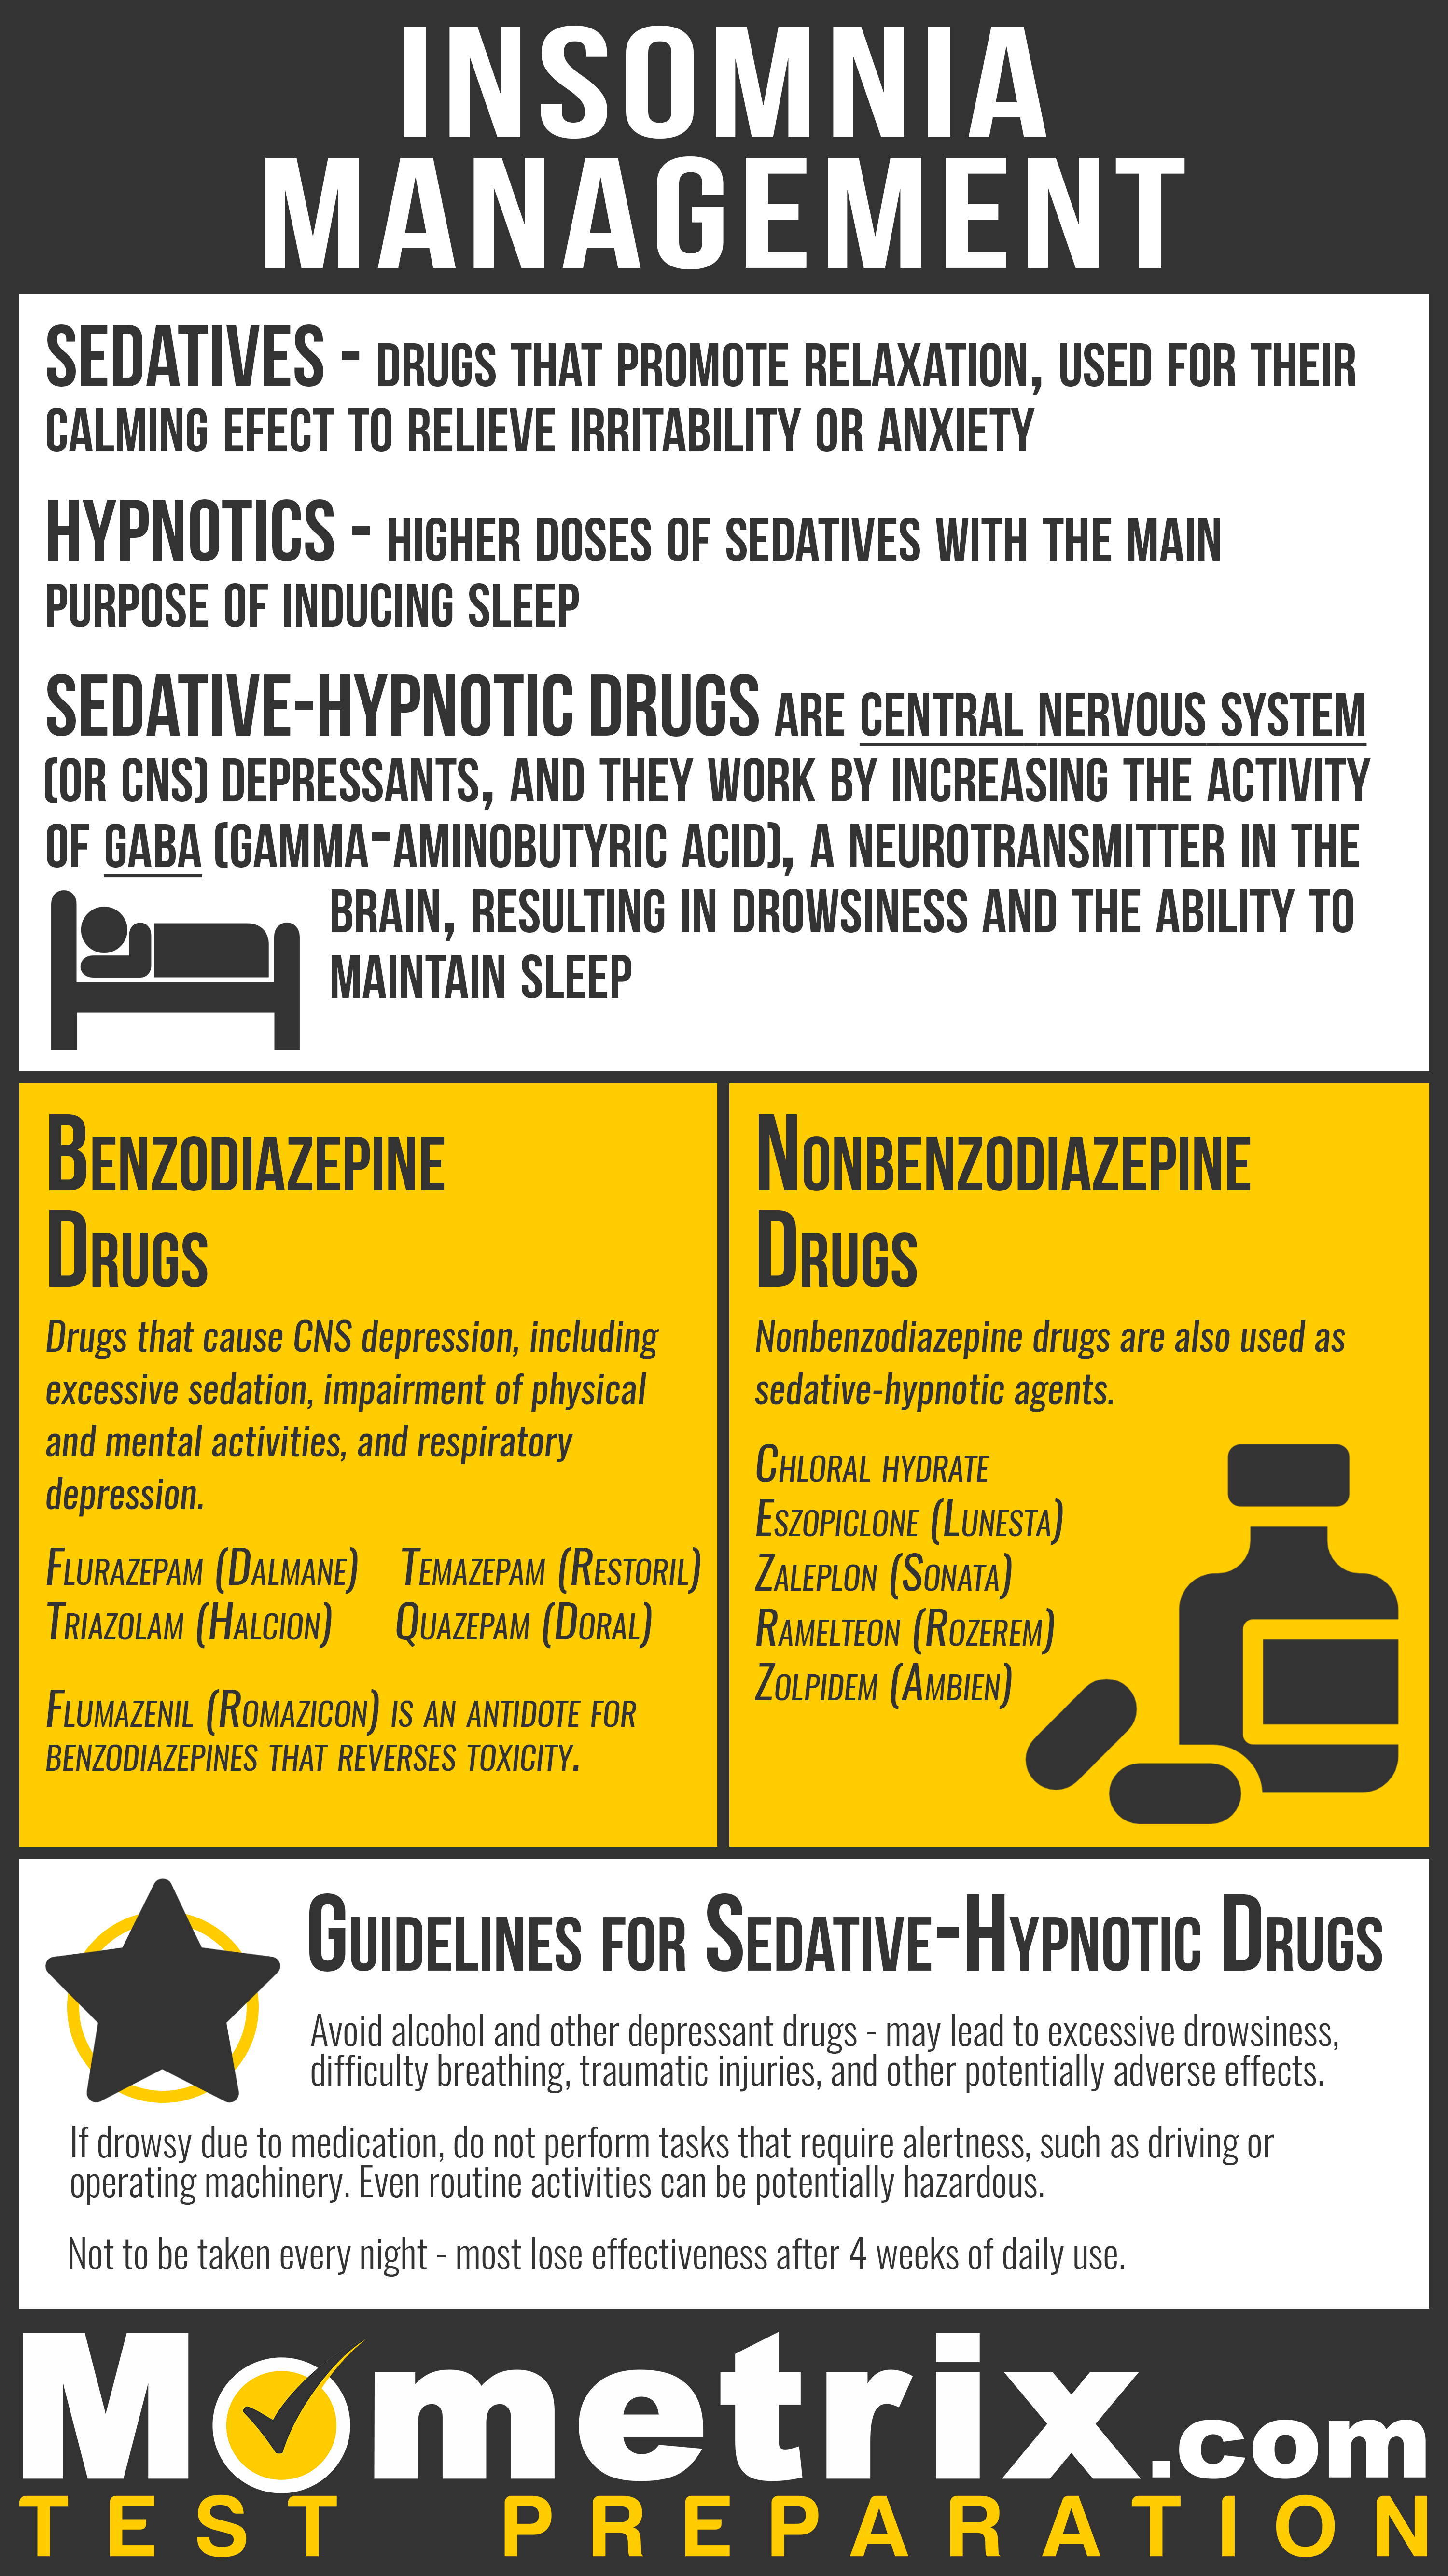 NCLEX Review - Sedative Hypnotic Drugs [Video]